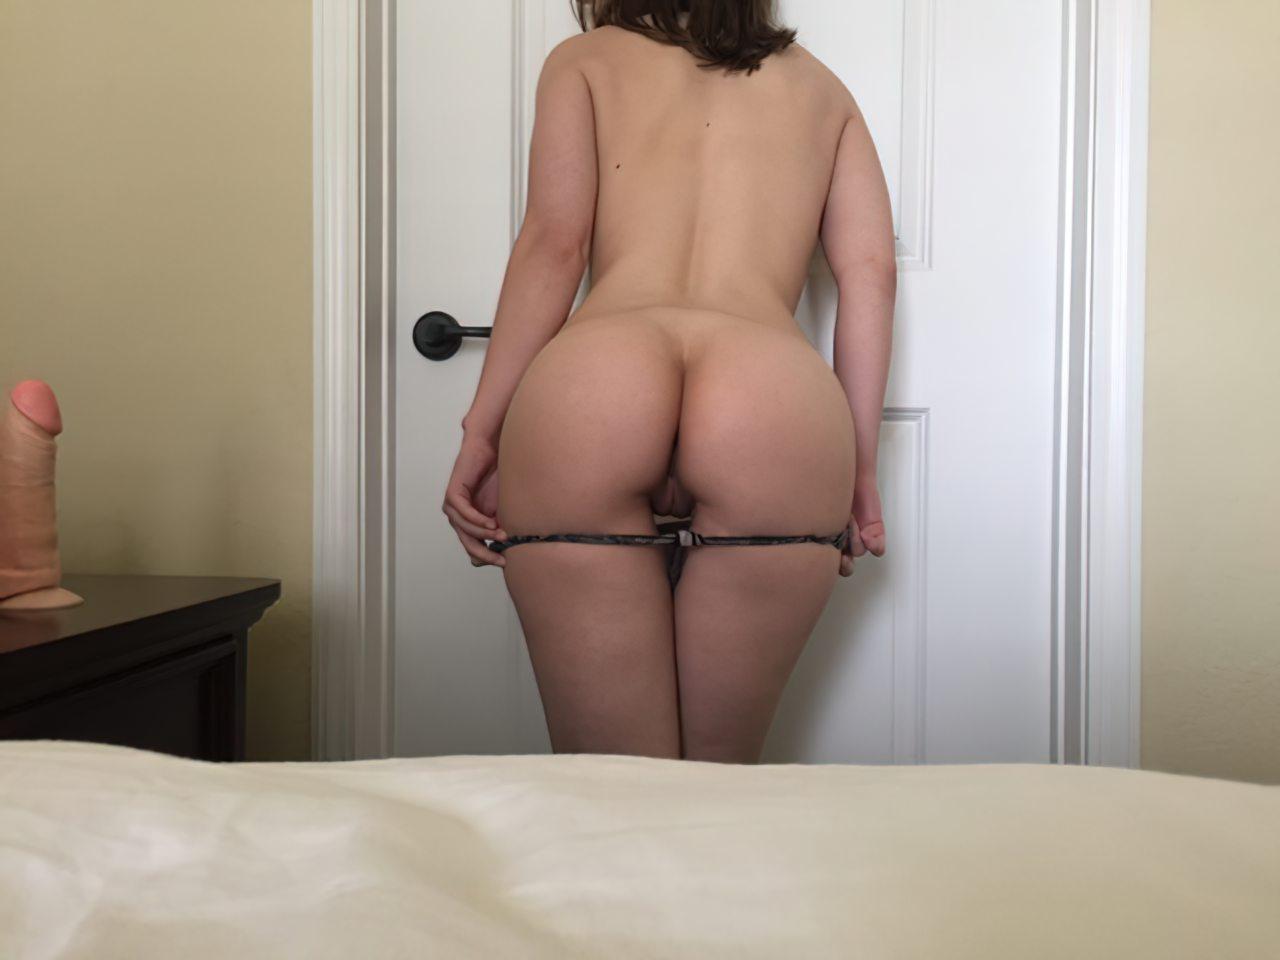 Amadora Se Masturbando no Quarto (2)